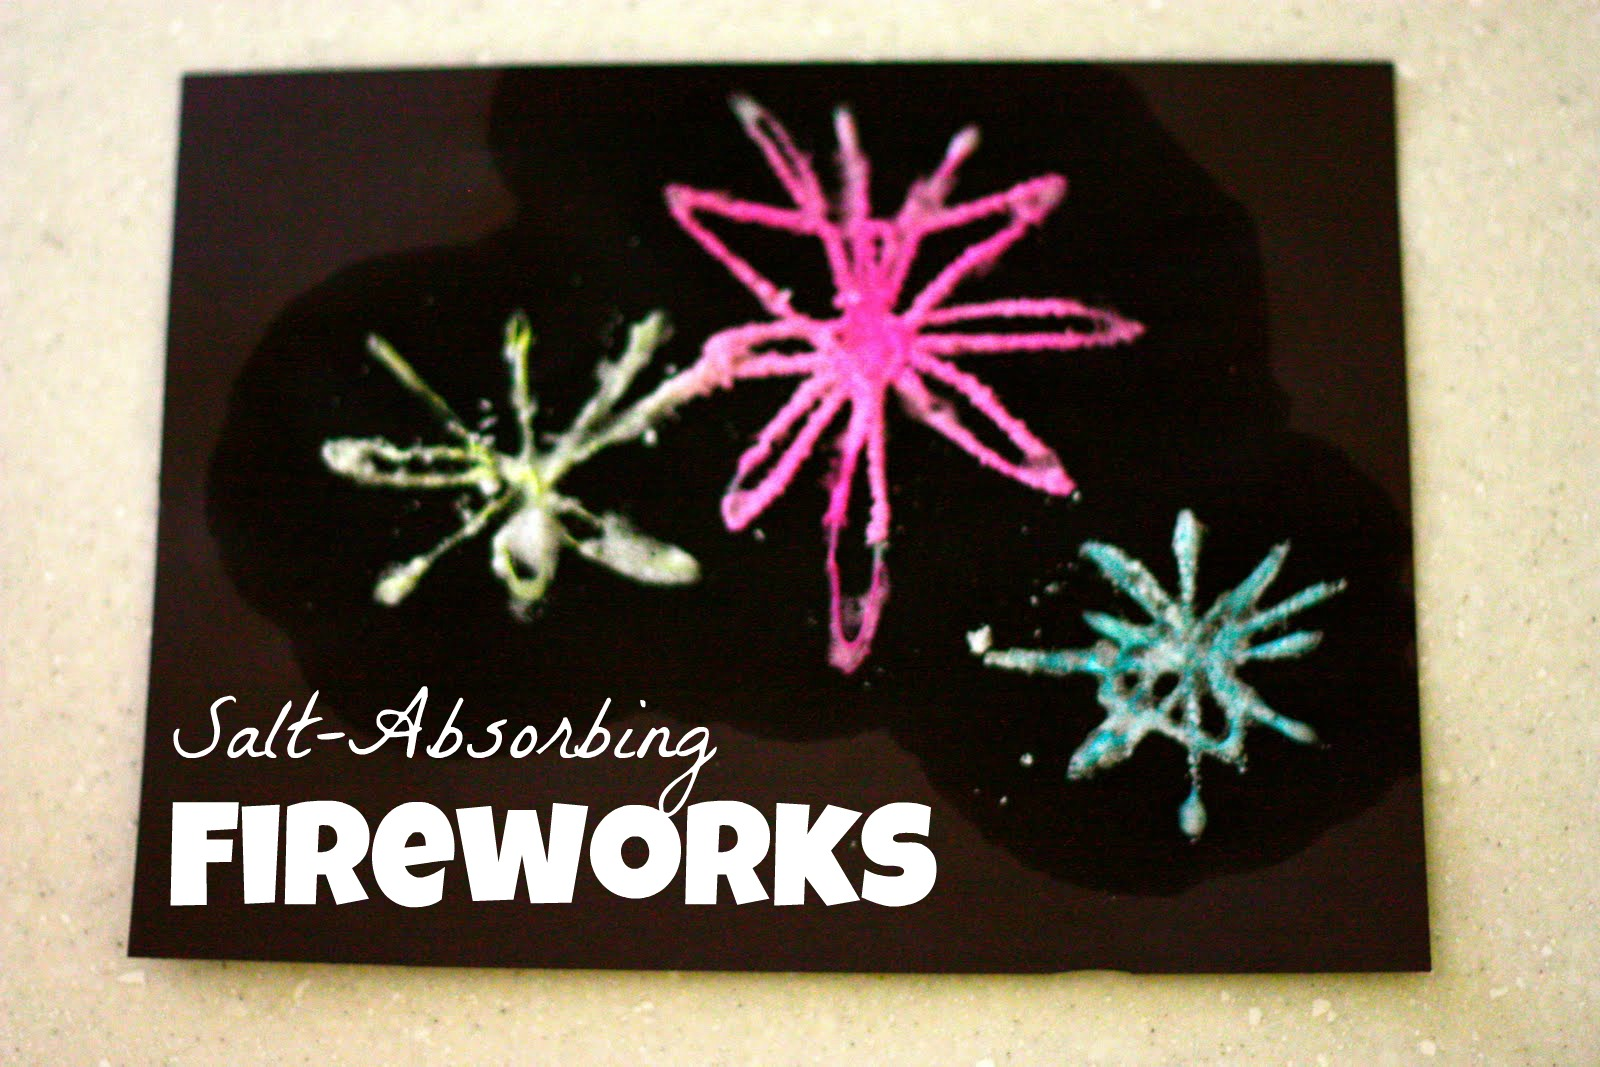 Salt-Absorbing Fireworks!